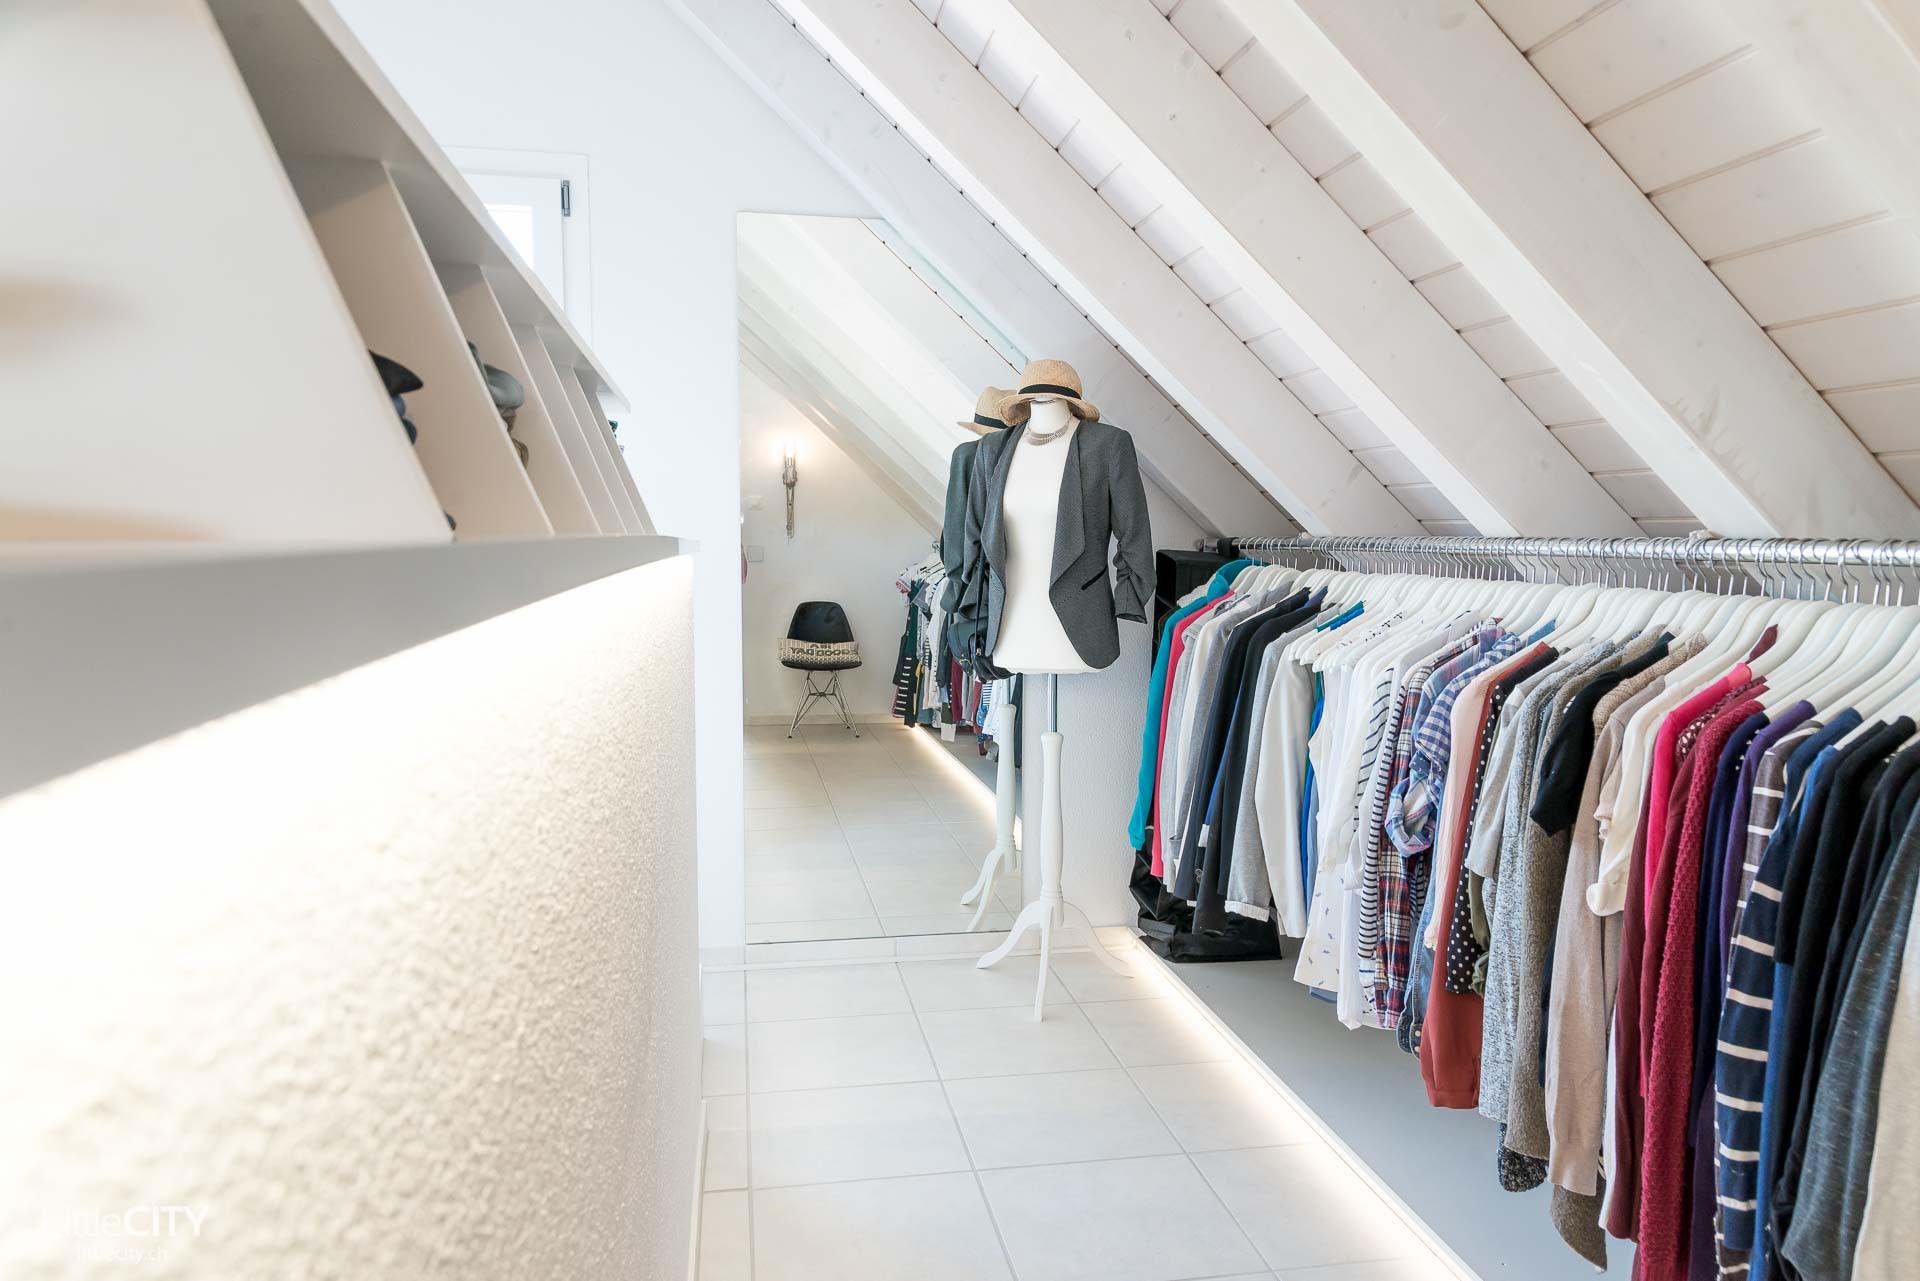 Diy Begehbarer Kleiderschrank  Selbstgebauter begehbarer Kleiderschrank